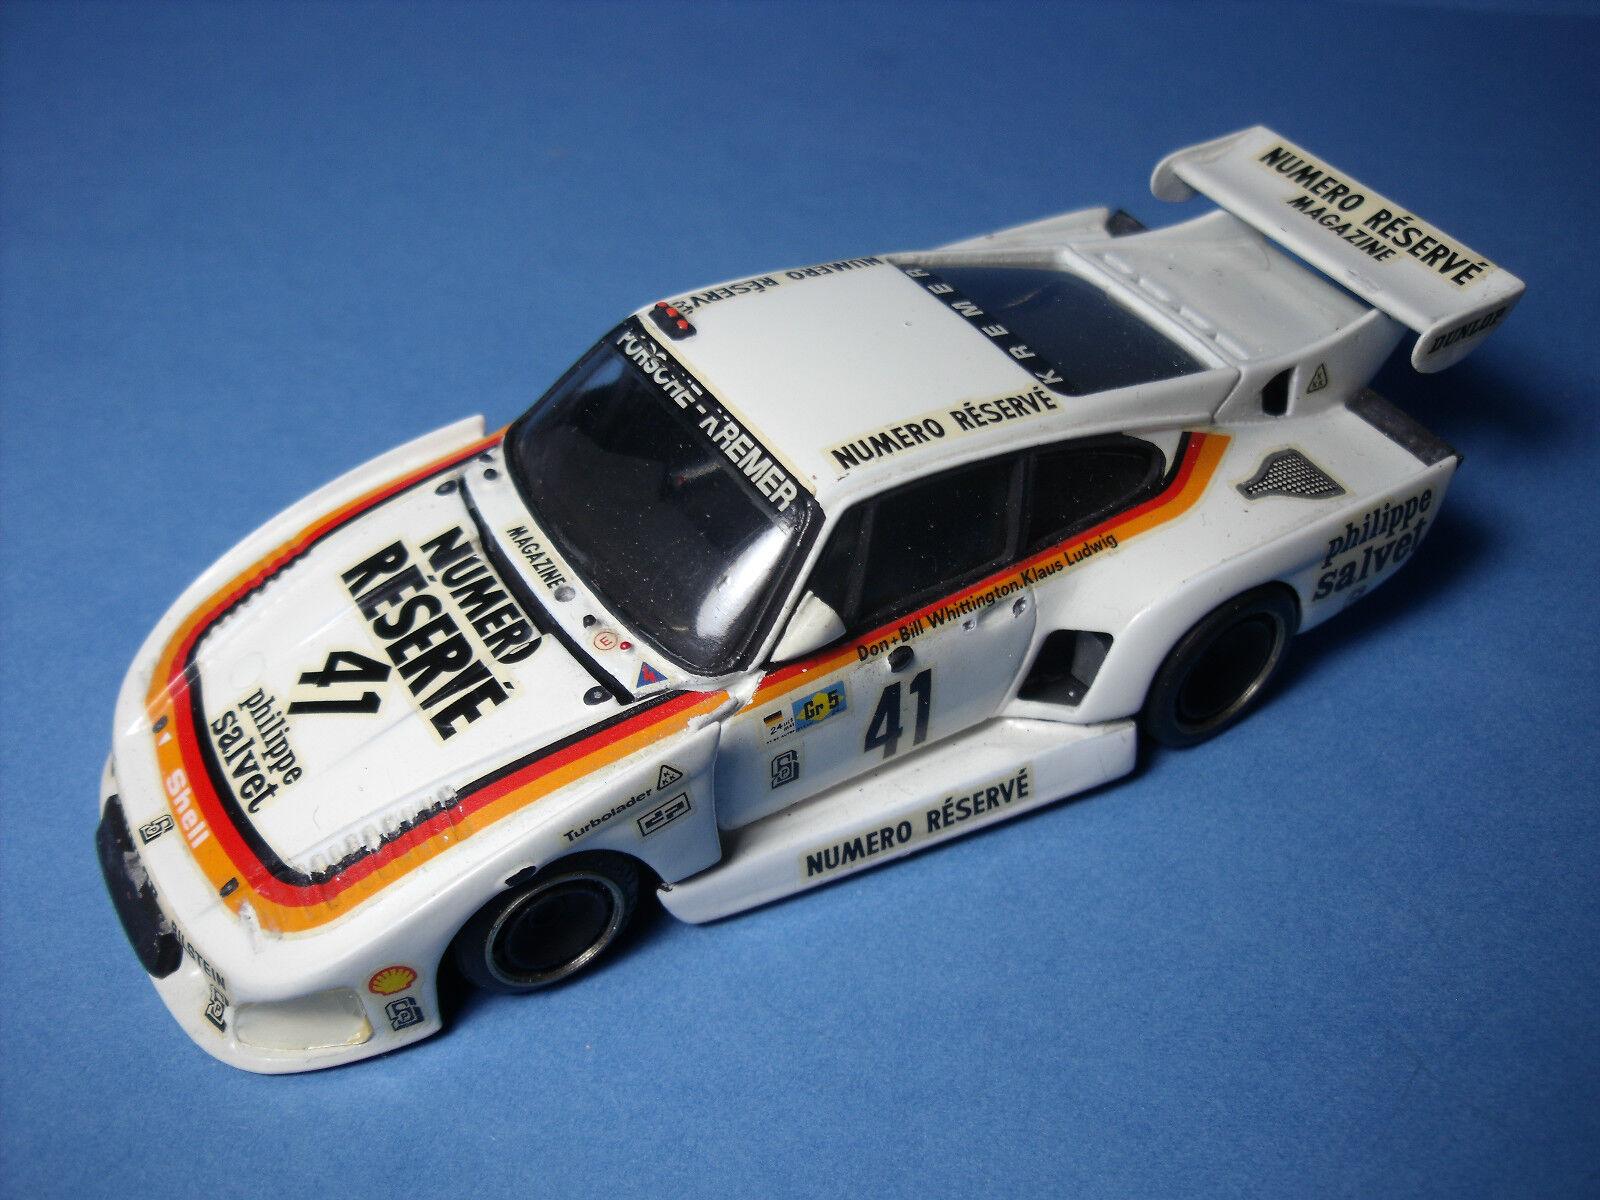 Porsche 935 k3 le  hommes 1979 kit amr 1 43 no spark starter esdo  garanti